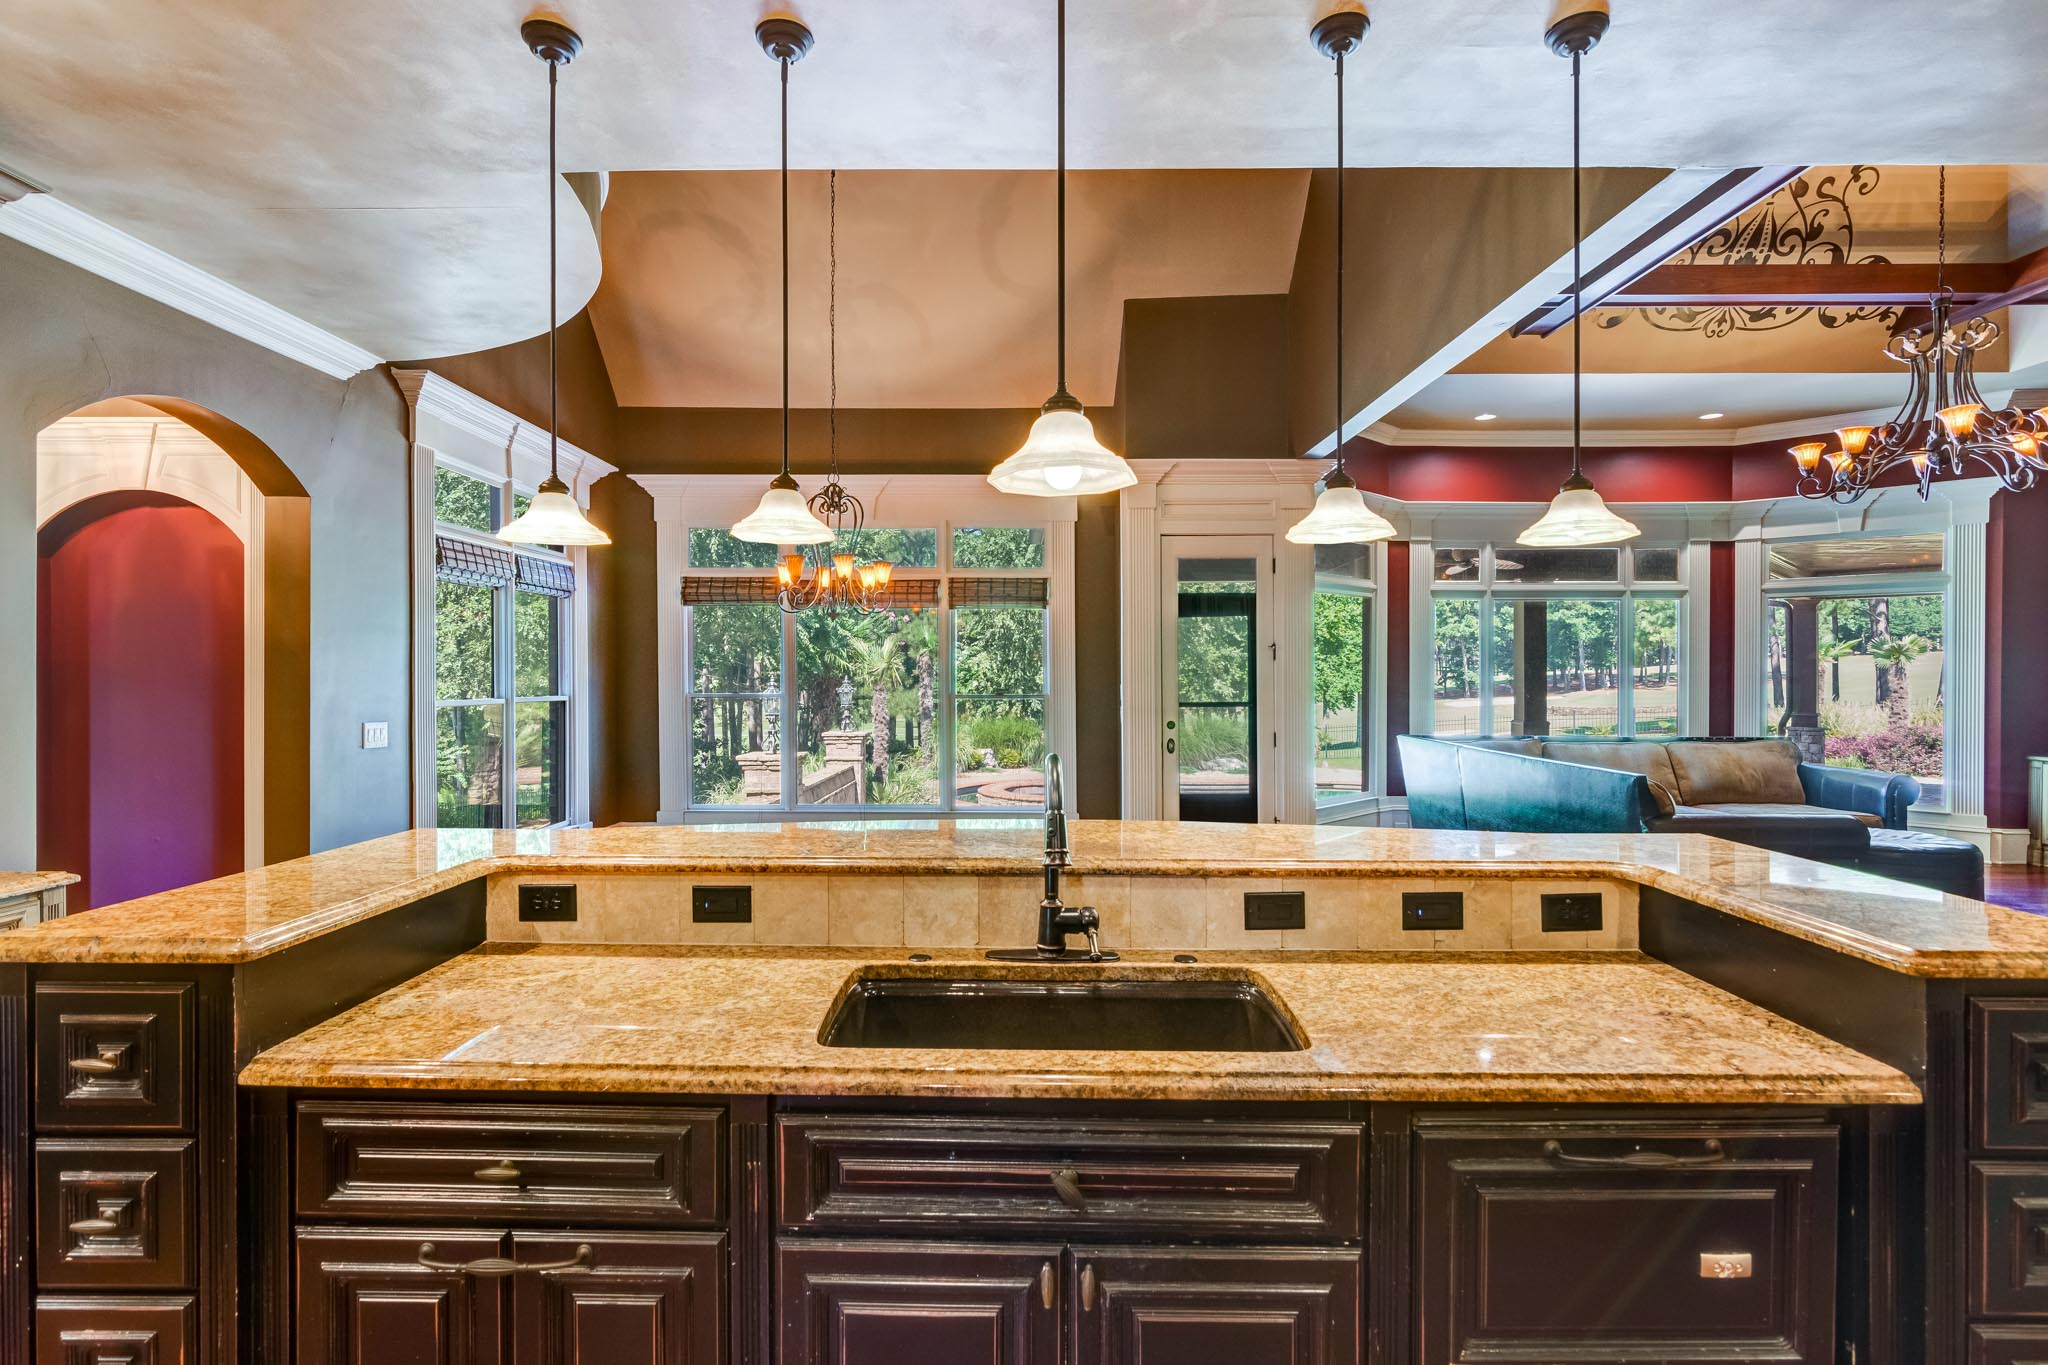 real_estate_photographer_kitchen_photography-4.jpg